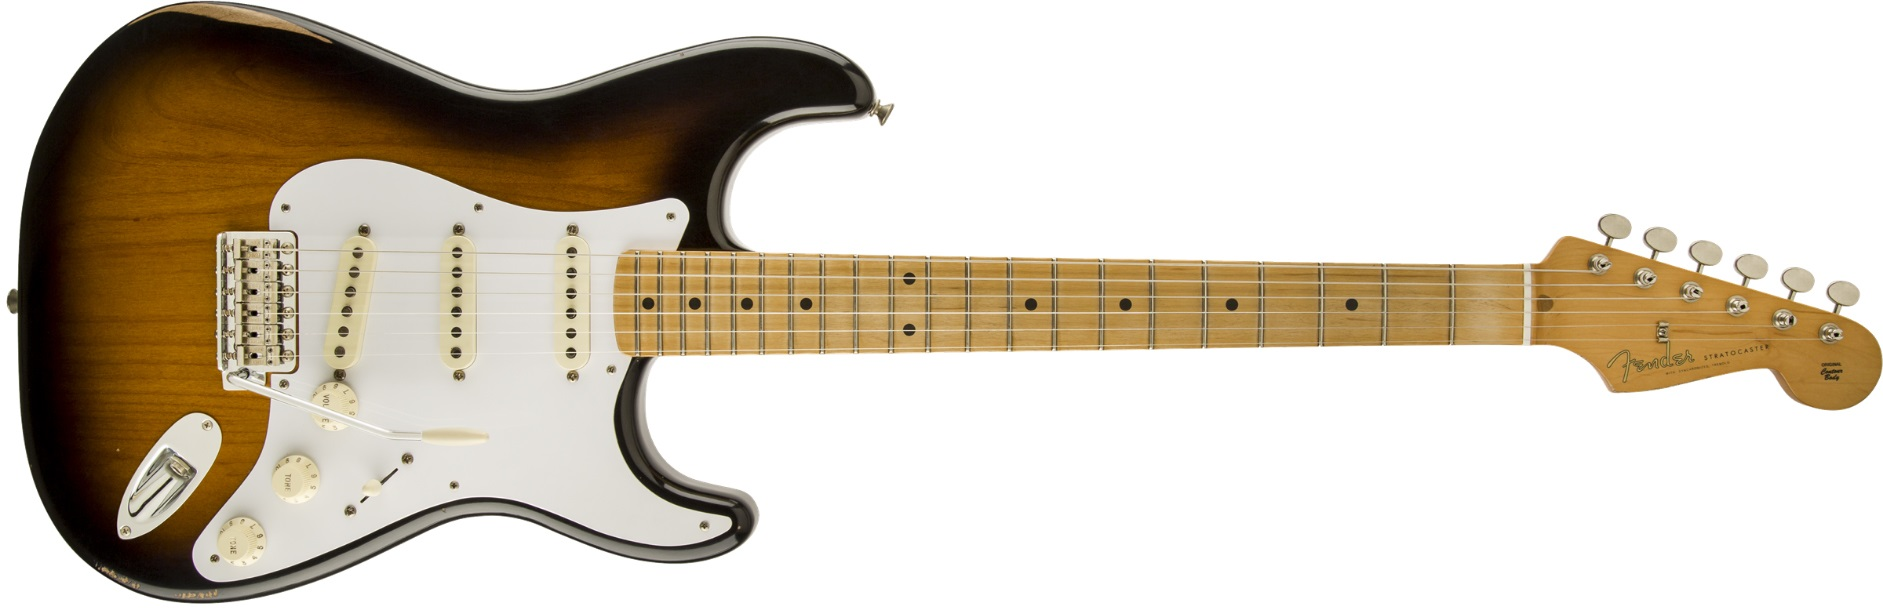 Fender Road Worn 50s Stratocaster MN 2SB